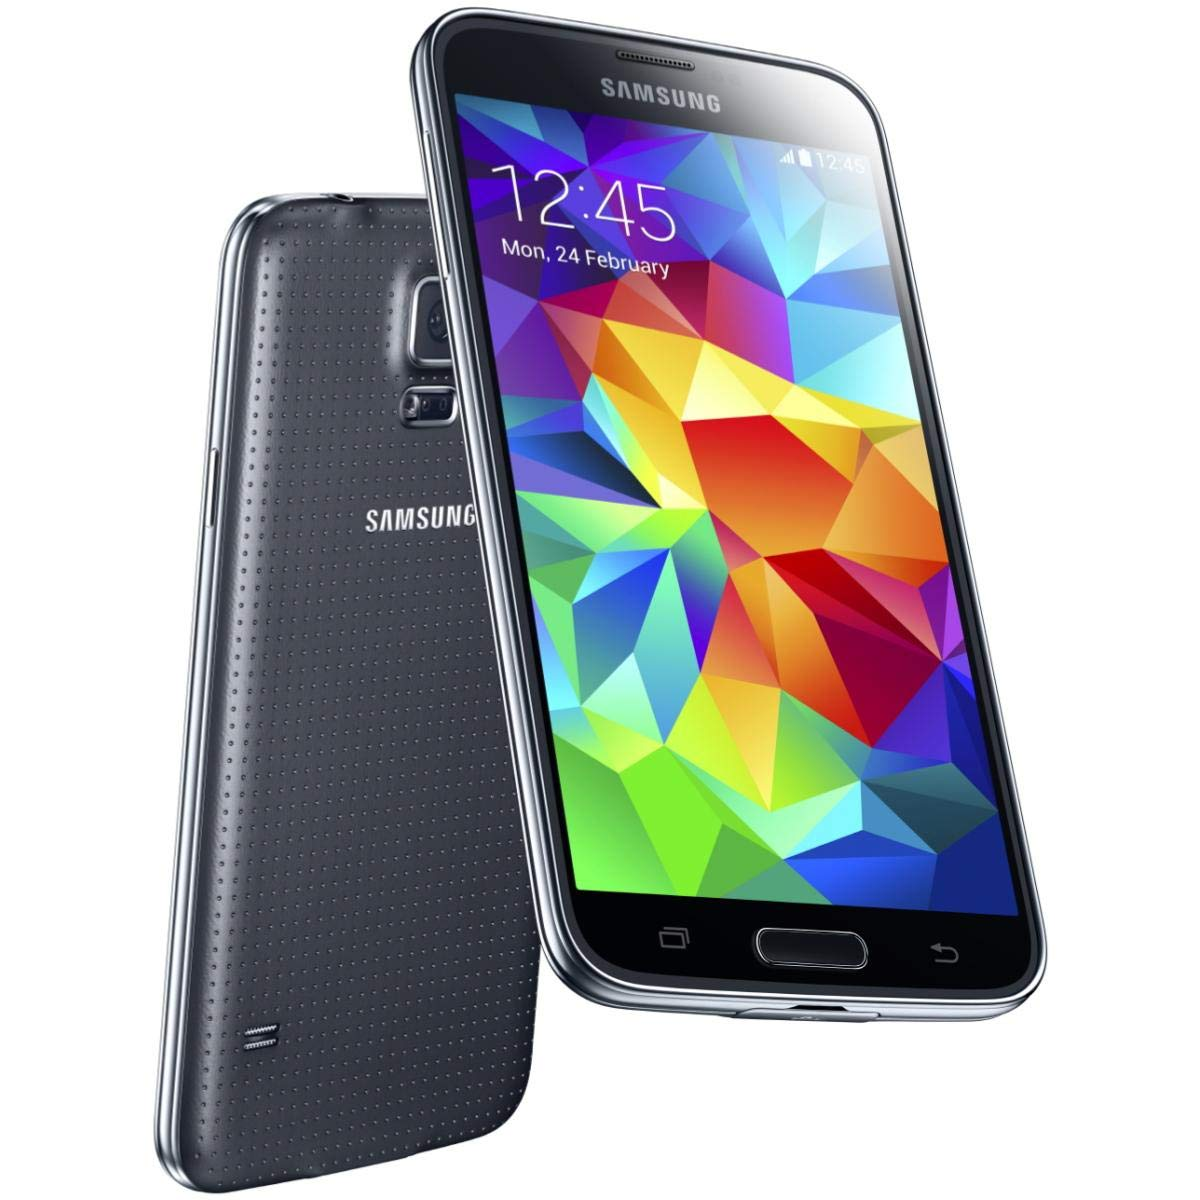 Amazon.com: Samsung Galaxy S5 - G900-16GB - GSM Desbloqueado ...